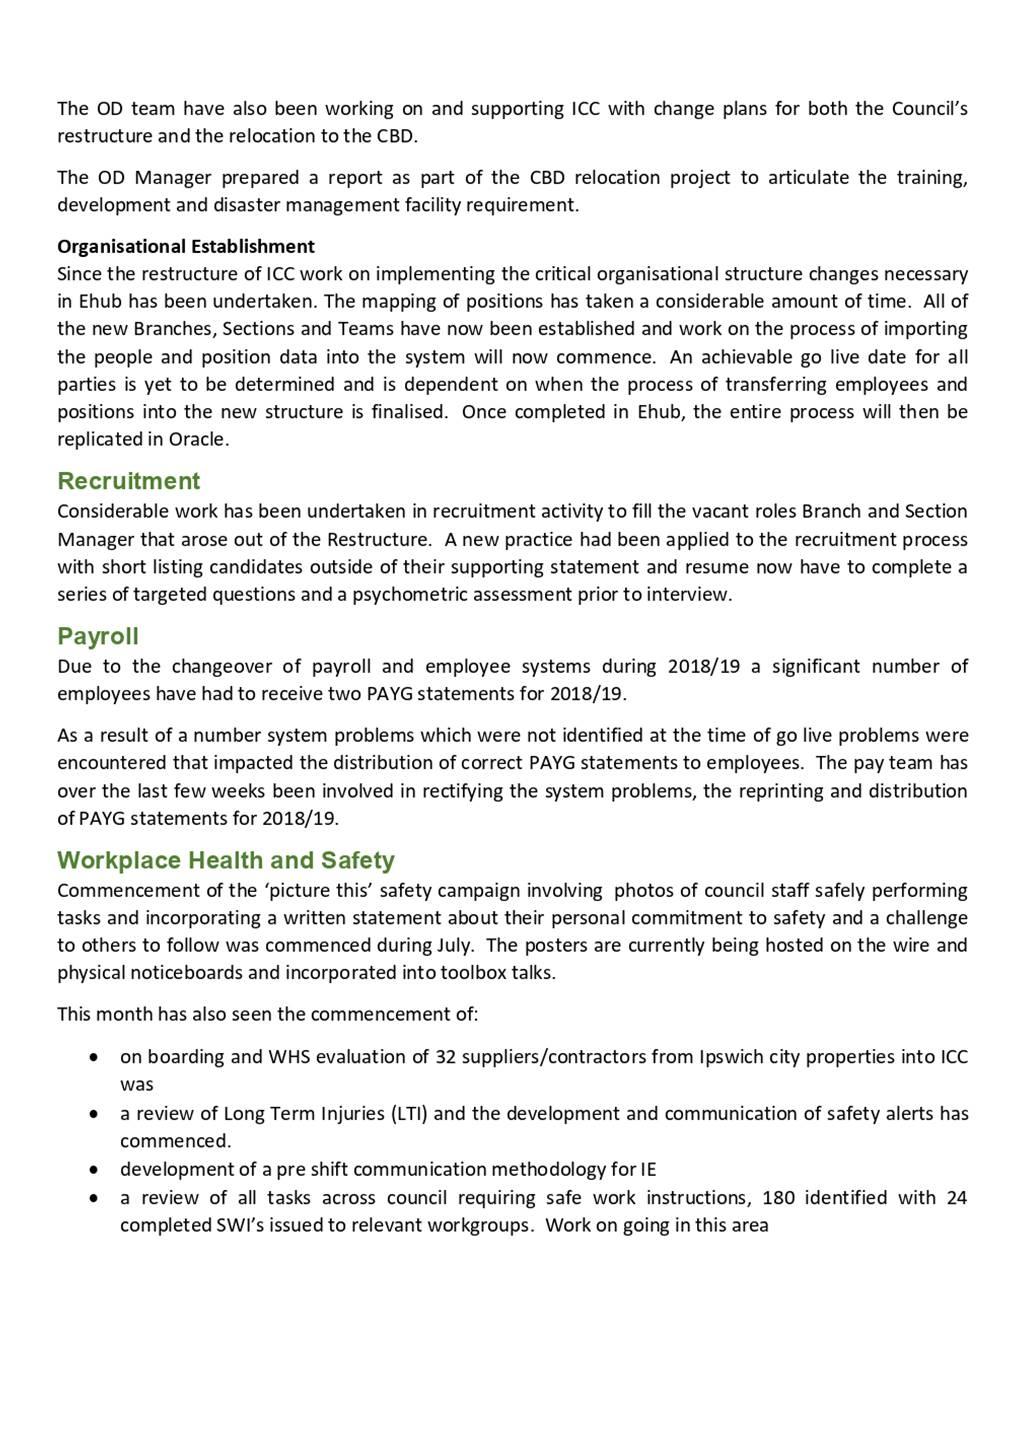 Agenda Of Governance Committee 13 August 2019